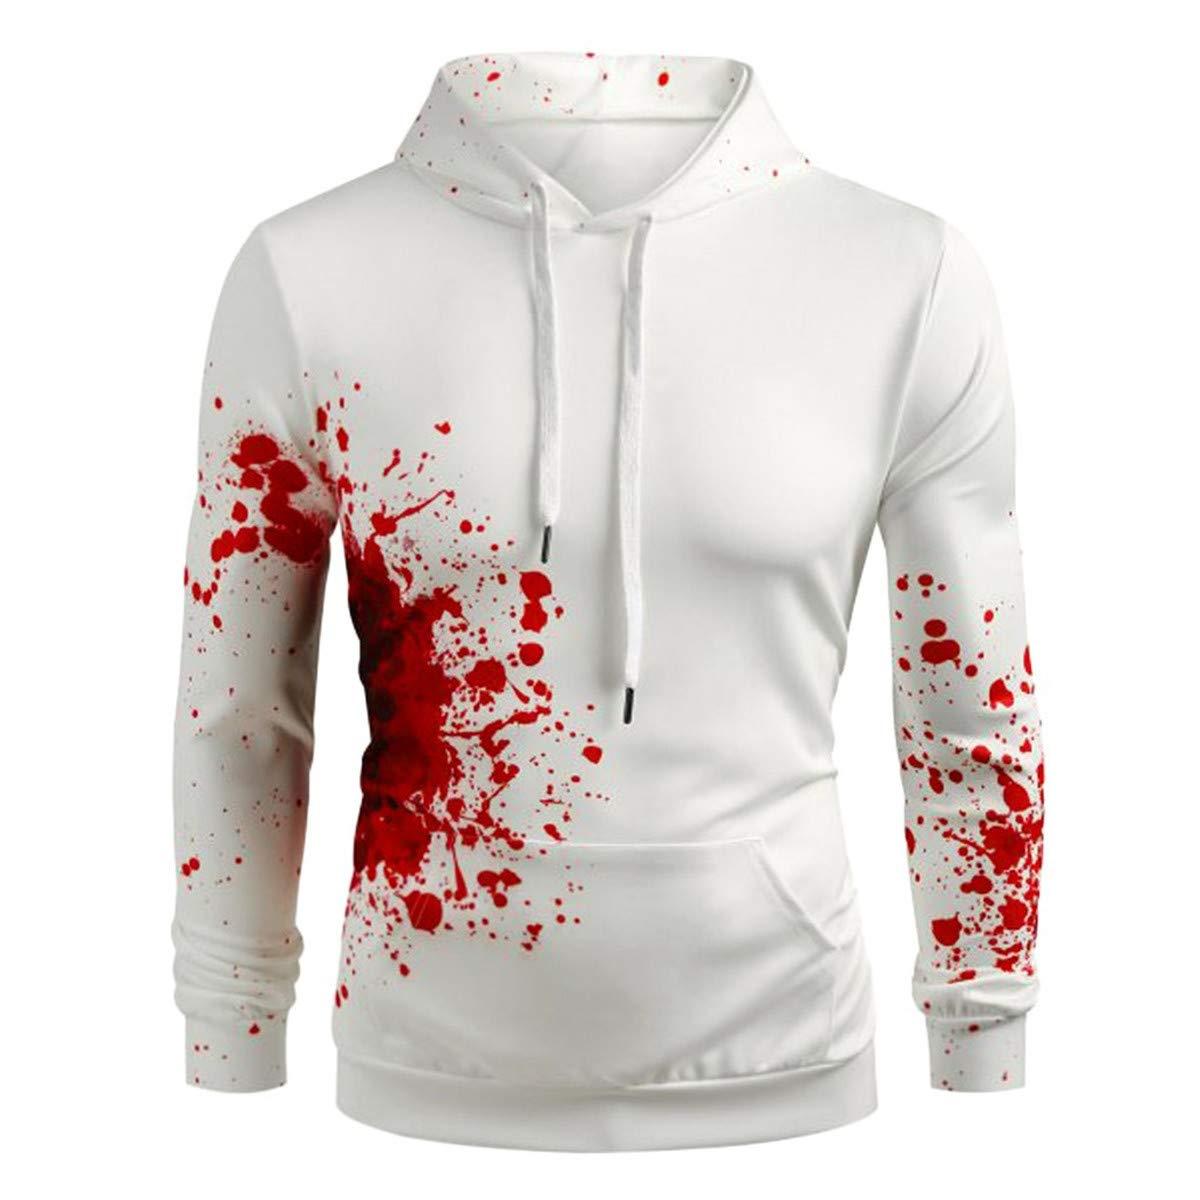 Thenxin Halloween Hooded Sweatshirt Men Bloody Patterned Drawstring Hoodie with Kangaroo Pocket(White-A,M) by Thenxin